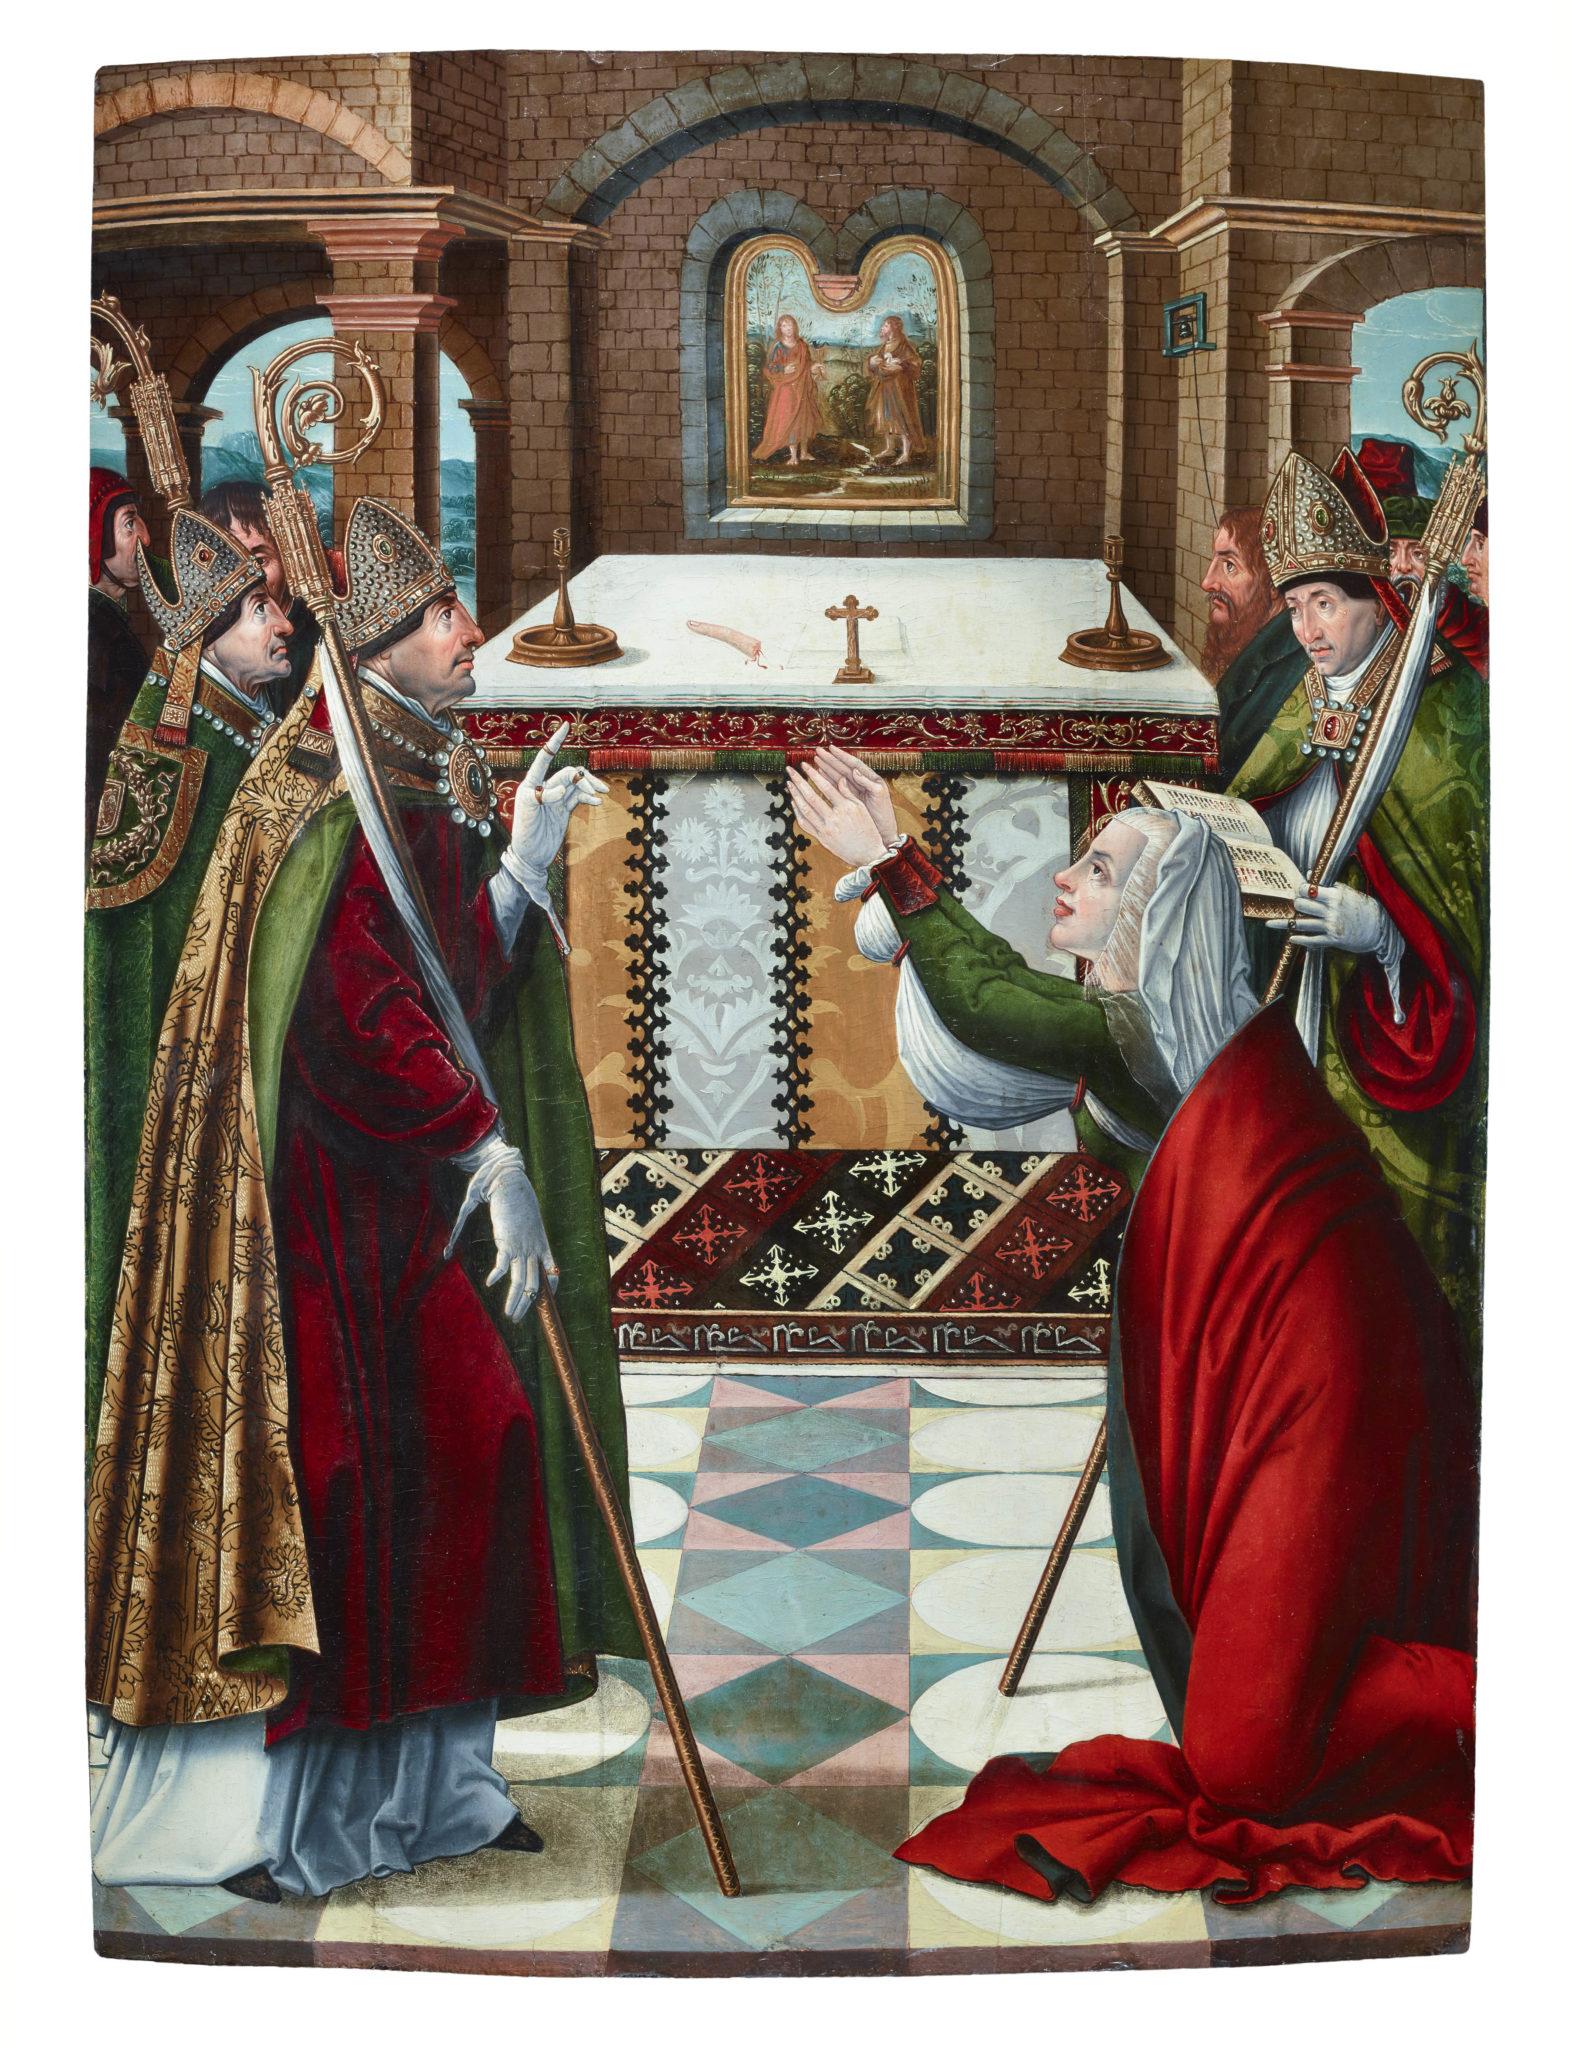 Maestro del Retablo dei due San Giovanni